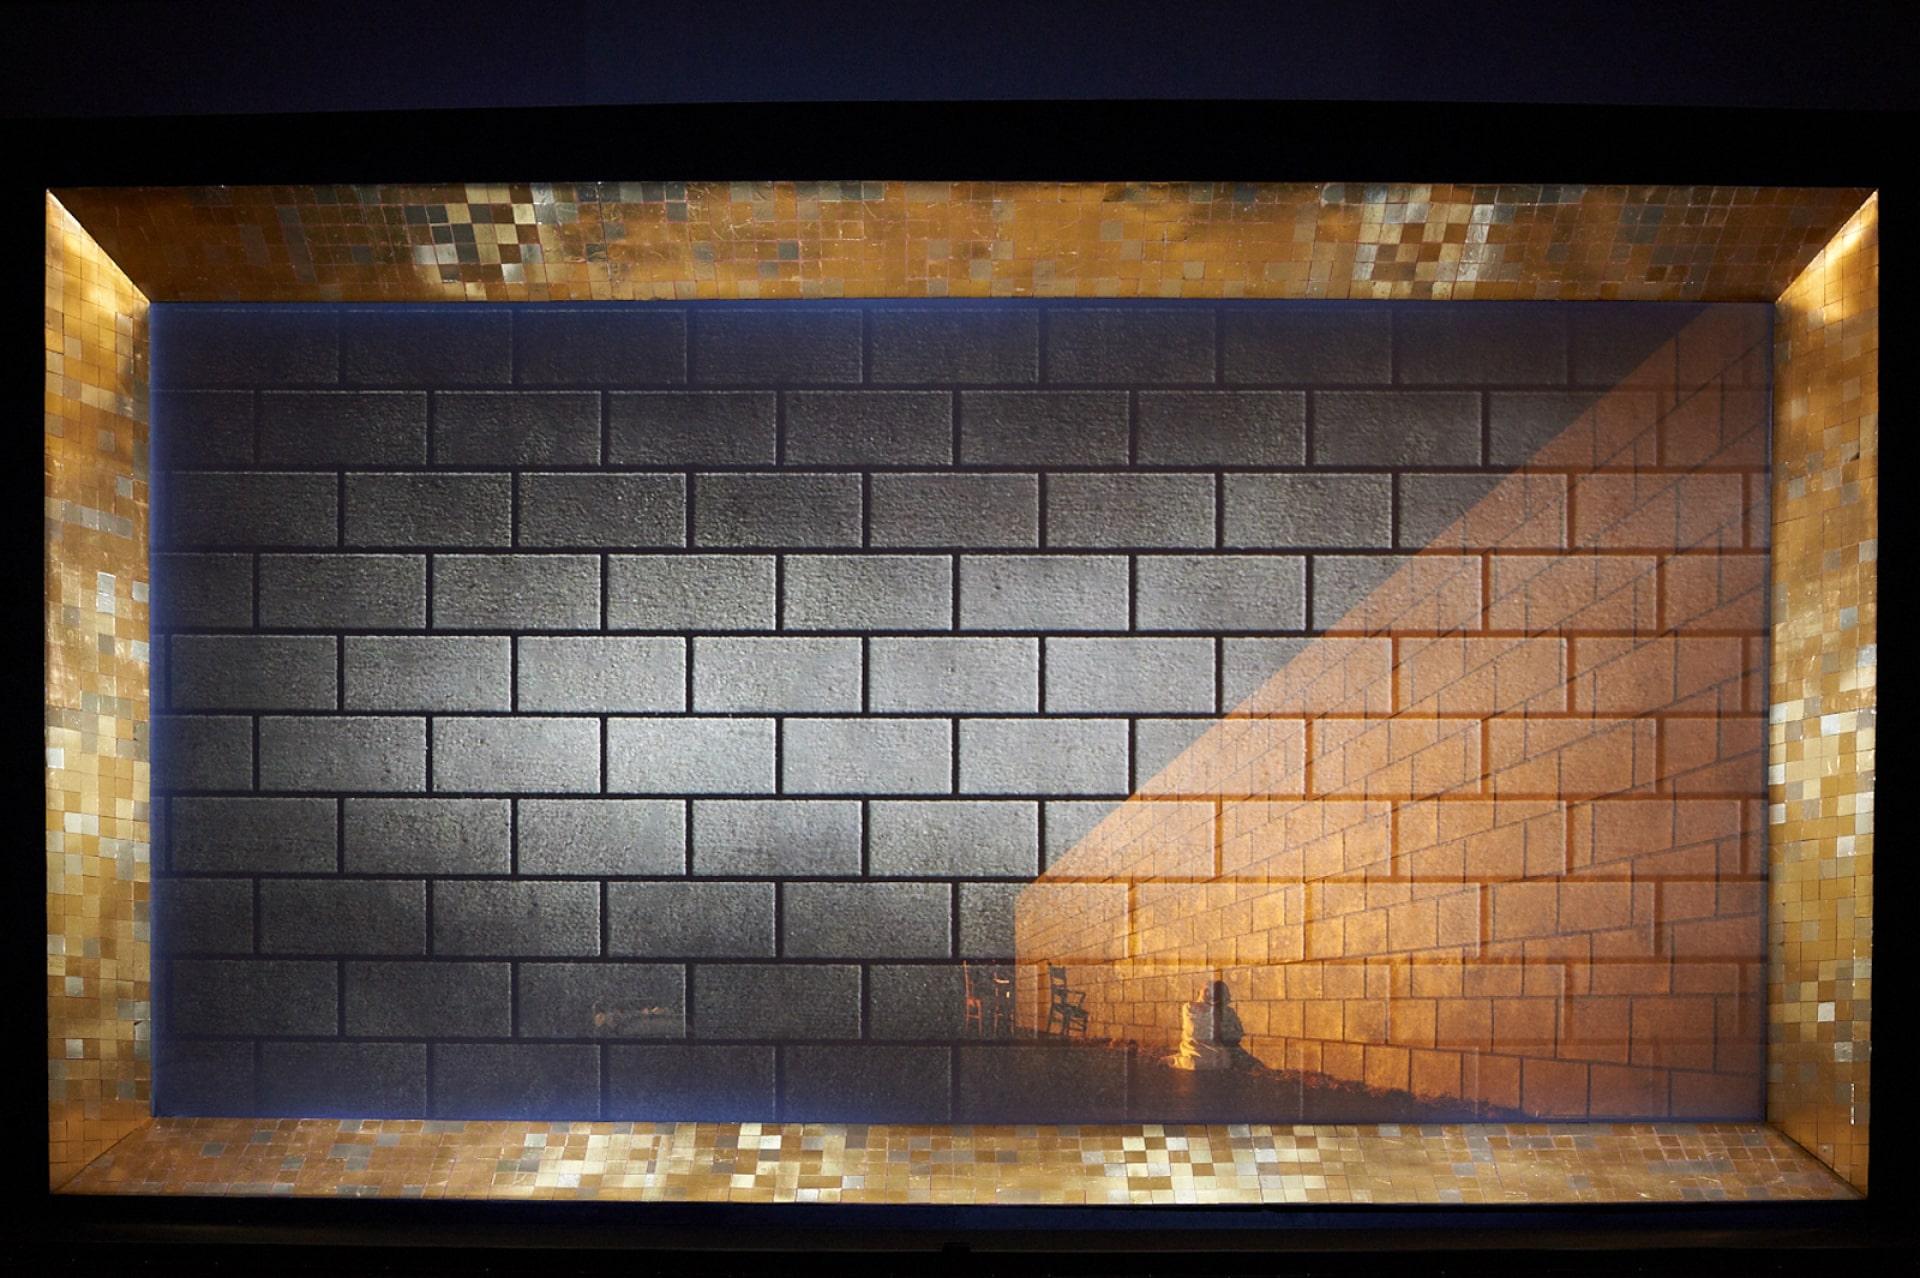 Gold tiles frame transparent brick scrim, revealing angled brick wall behind.